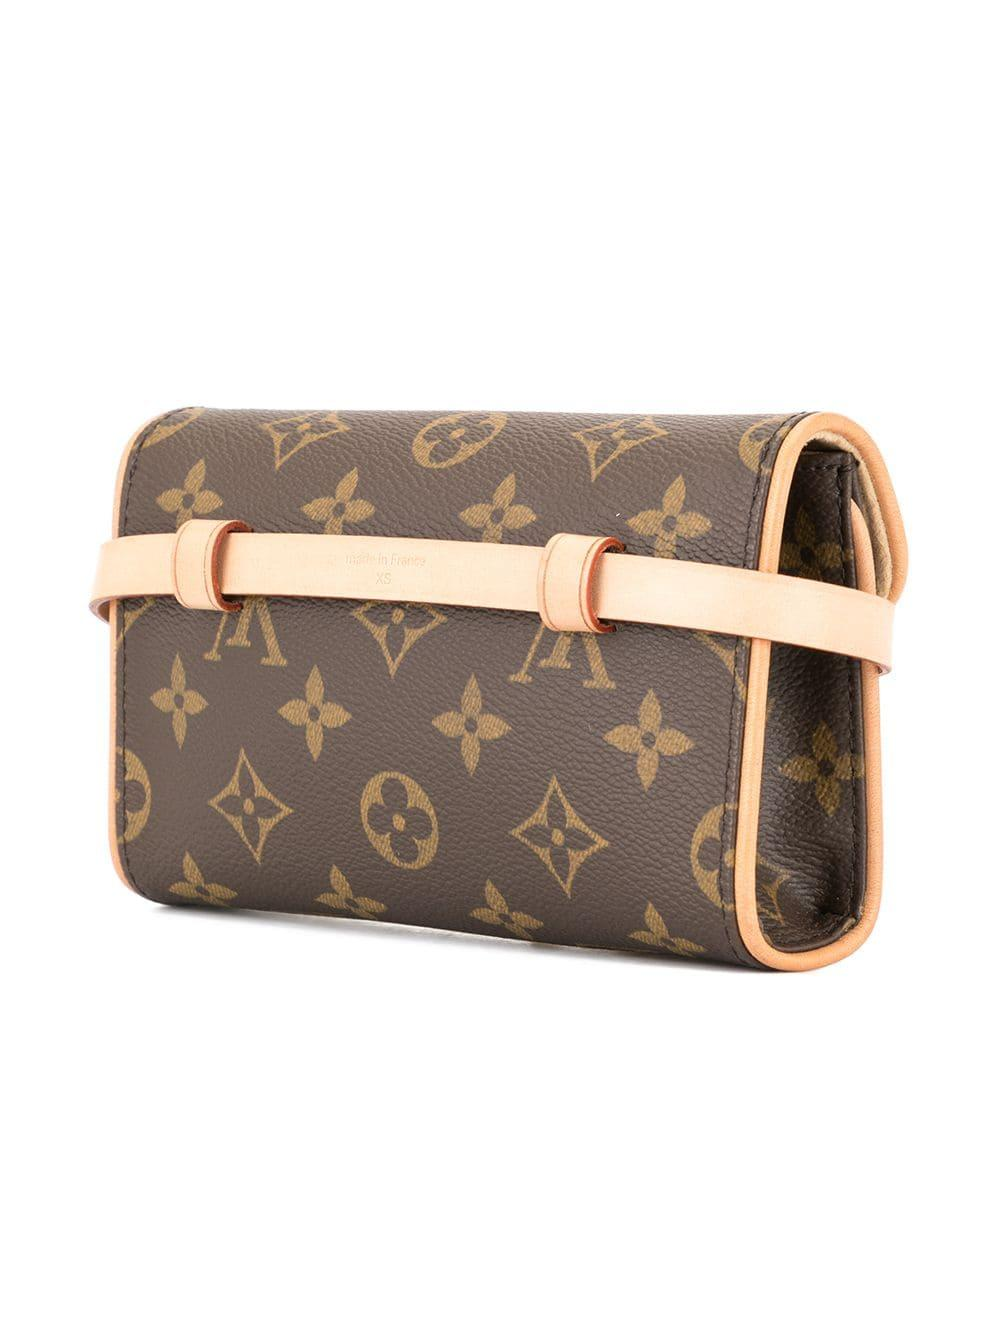 50adff64 Louis Vuitton Pre-Owned Florentine Pochette Xs Belt Bag in Brown - Lyst